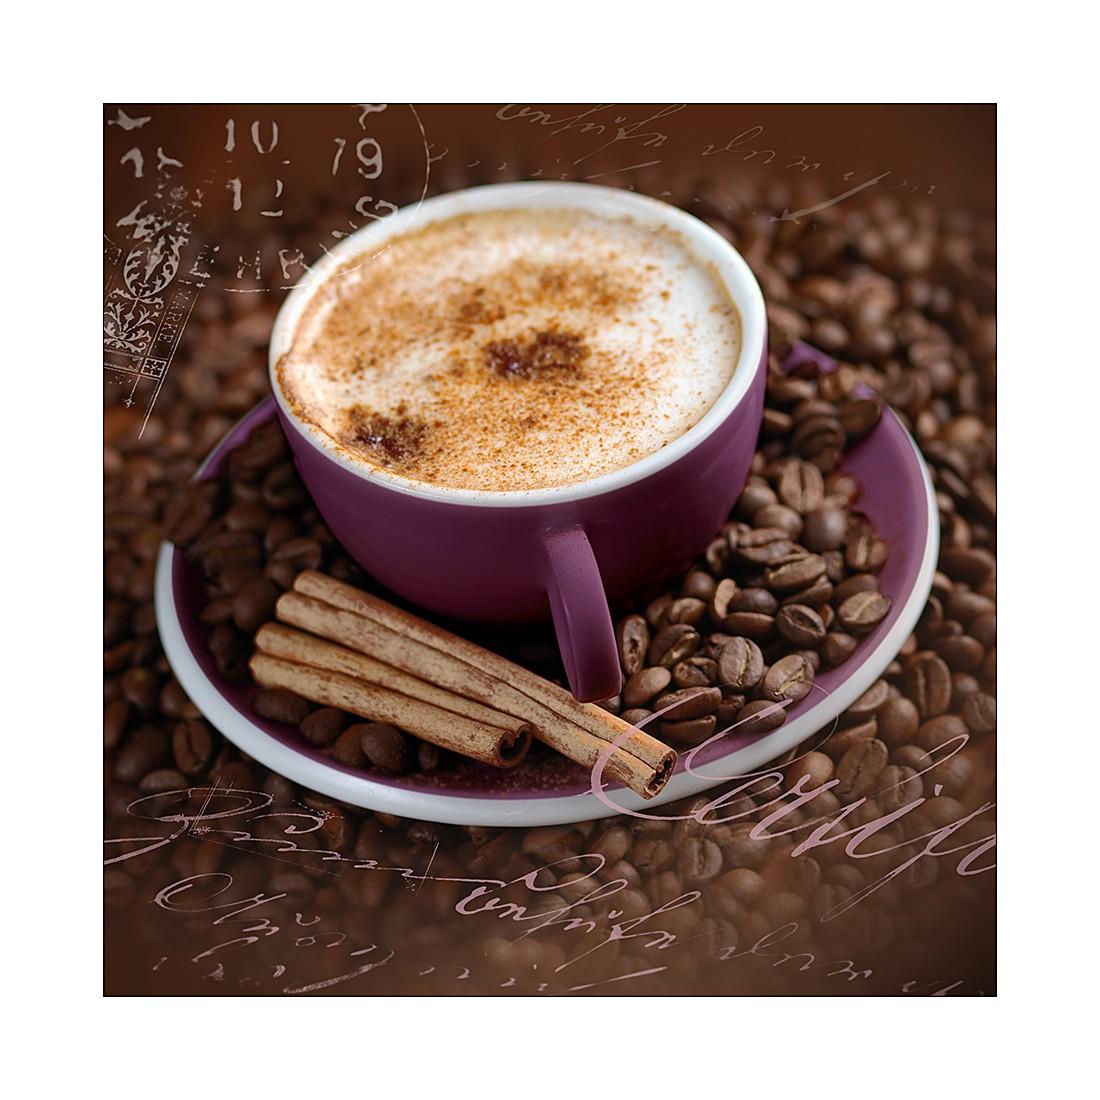 Kunstdruk Violett Coffee I - 50x50cm, Pro Art